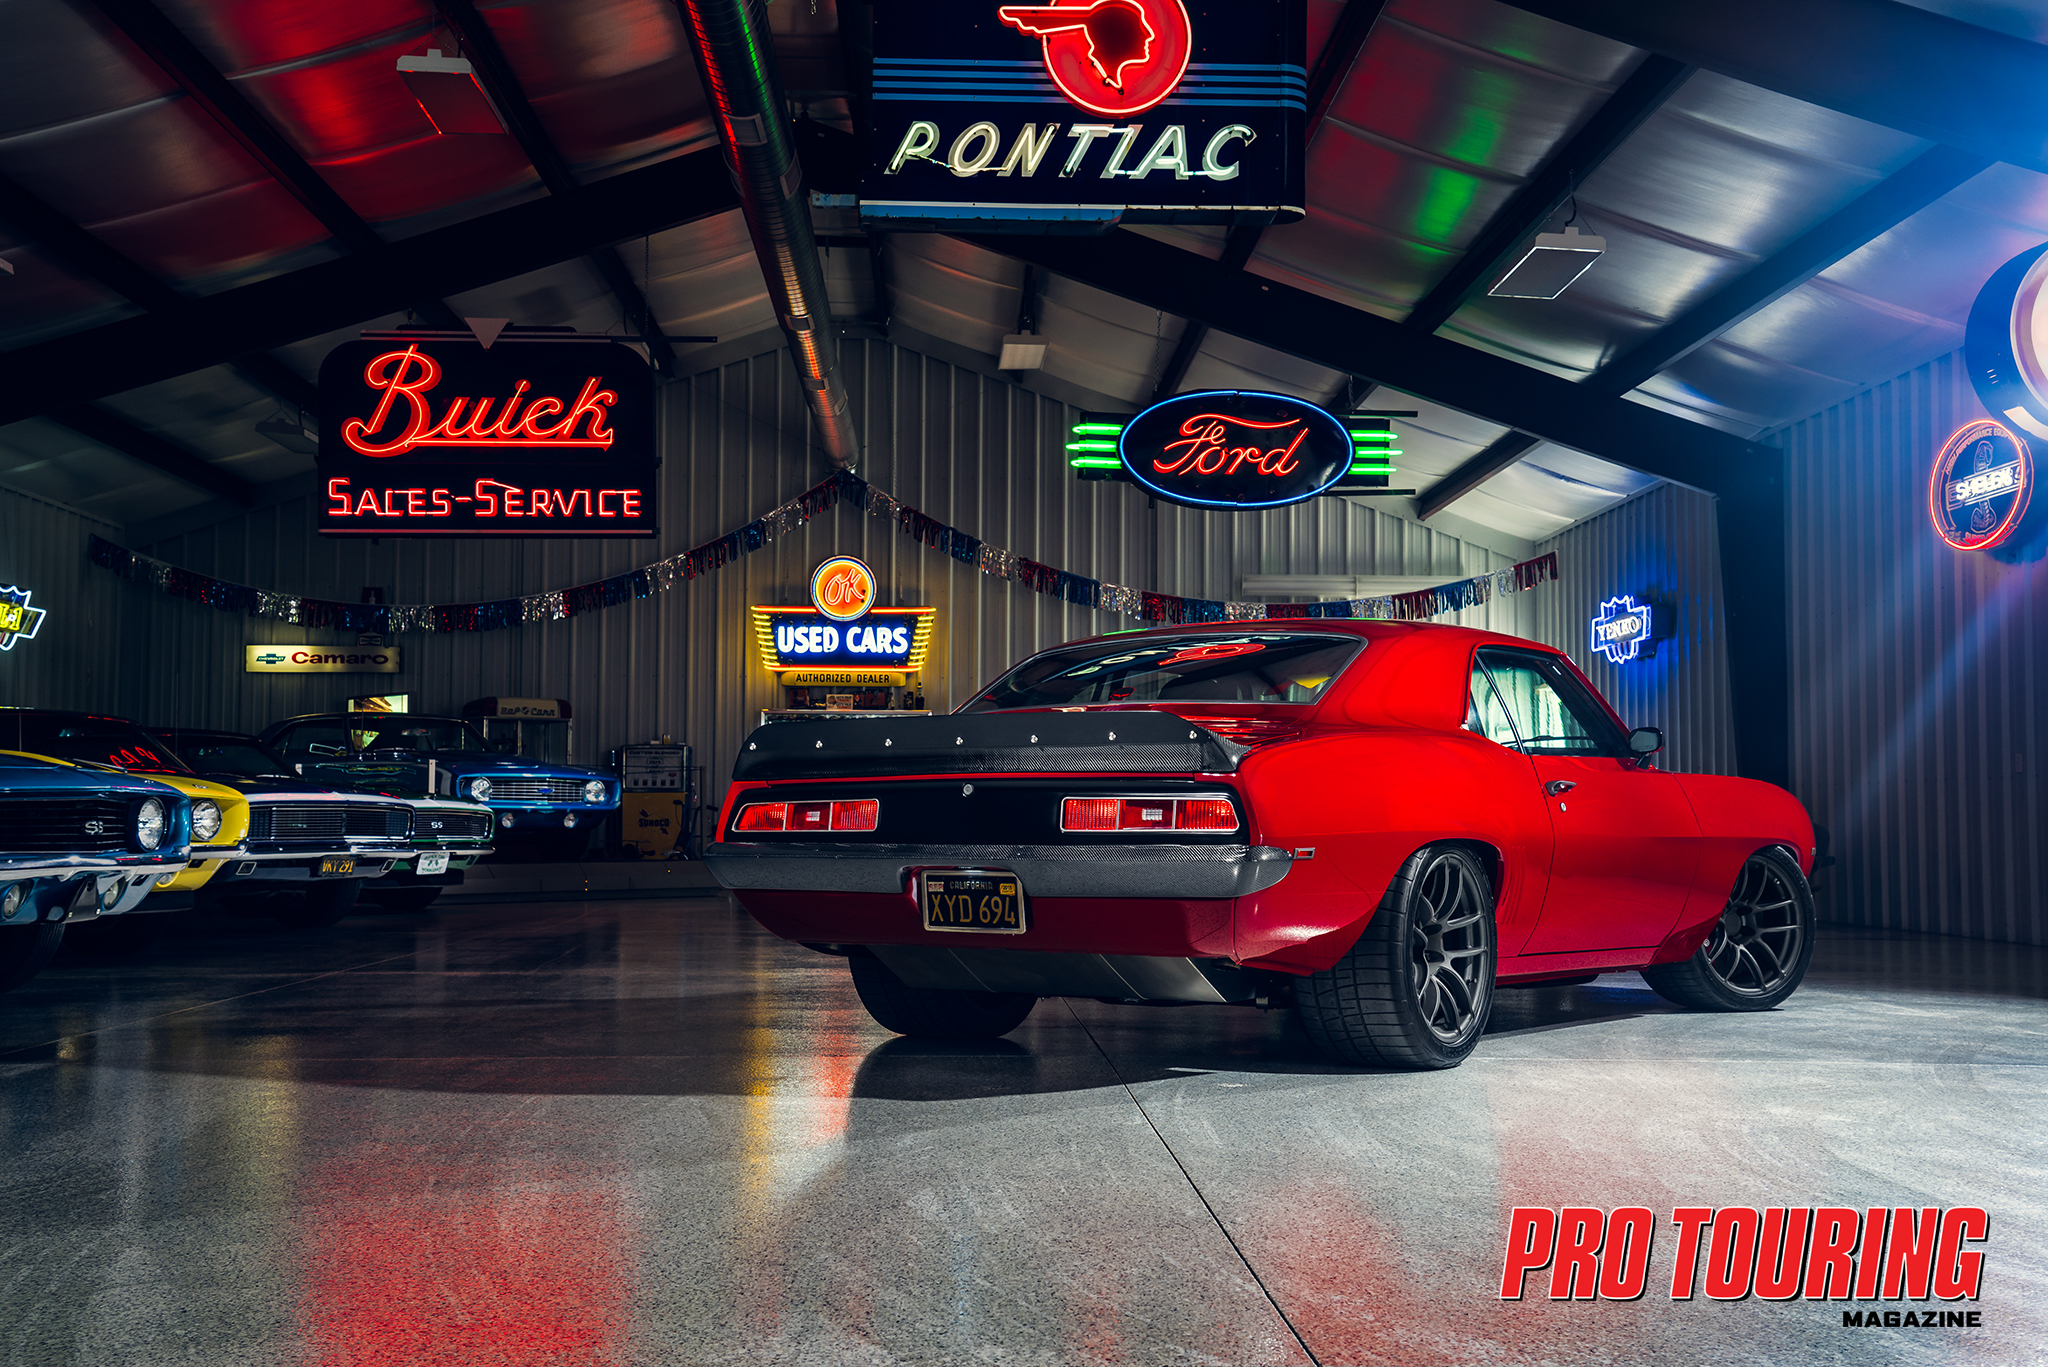 Pro Touring Magazine - COMING SOON! - Rides Magazine